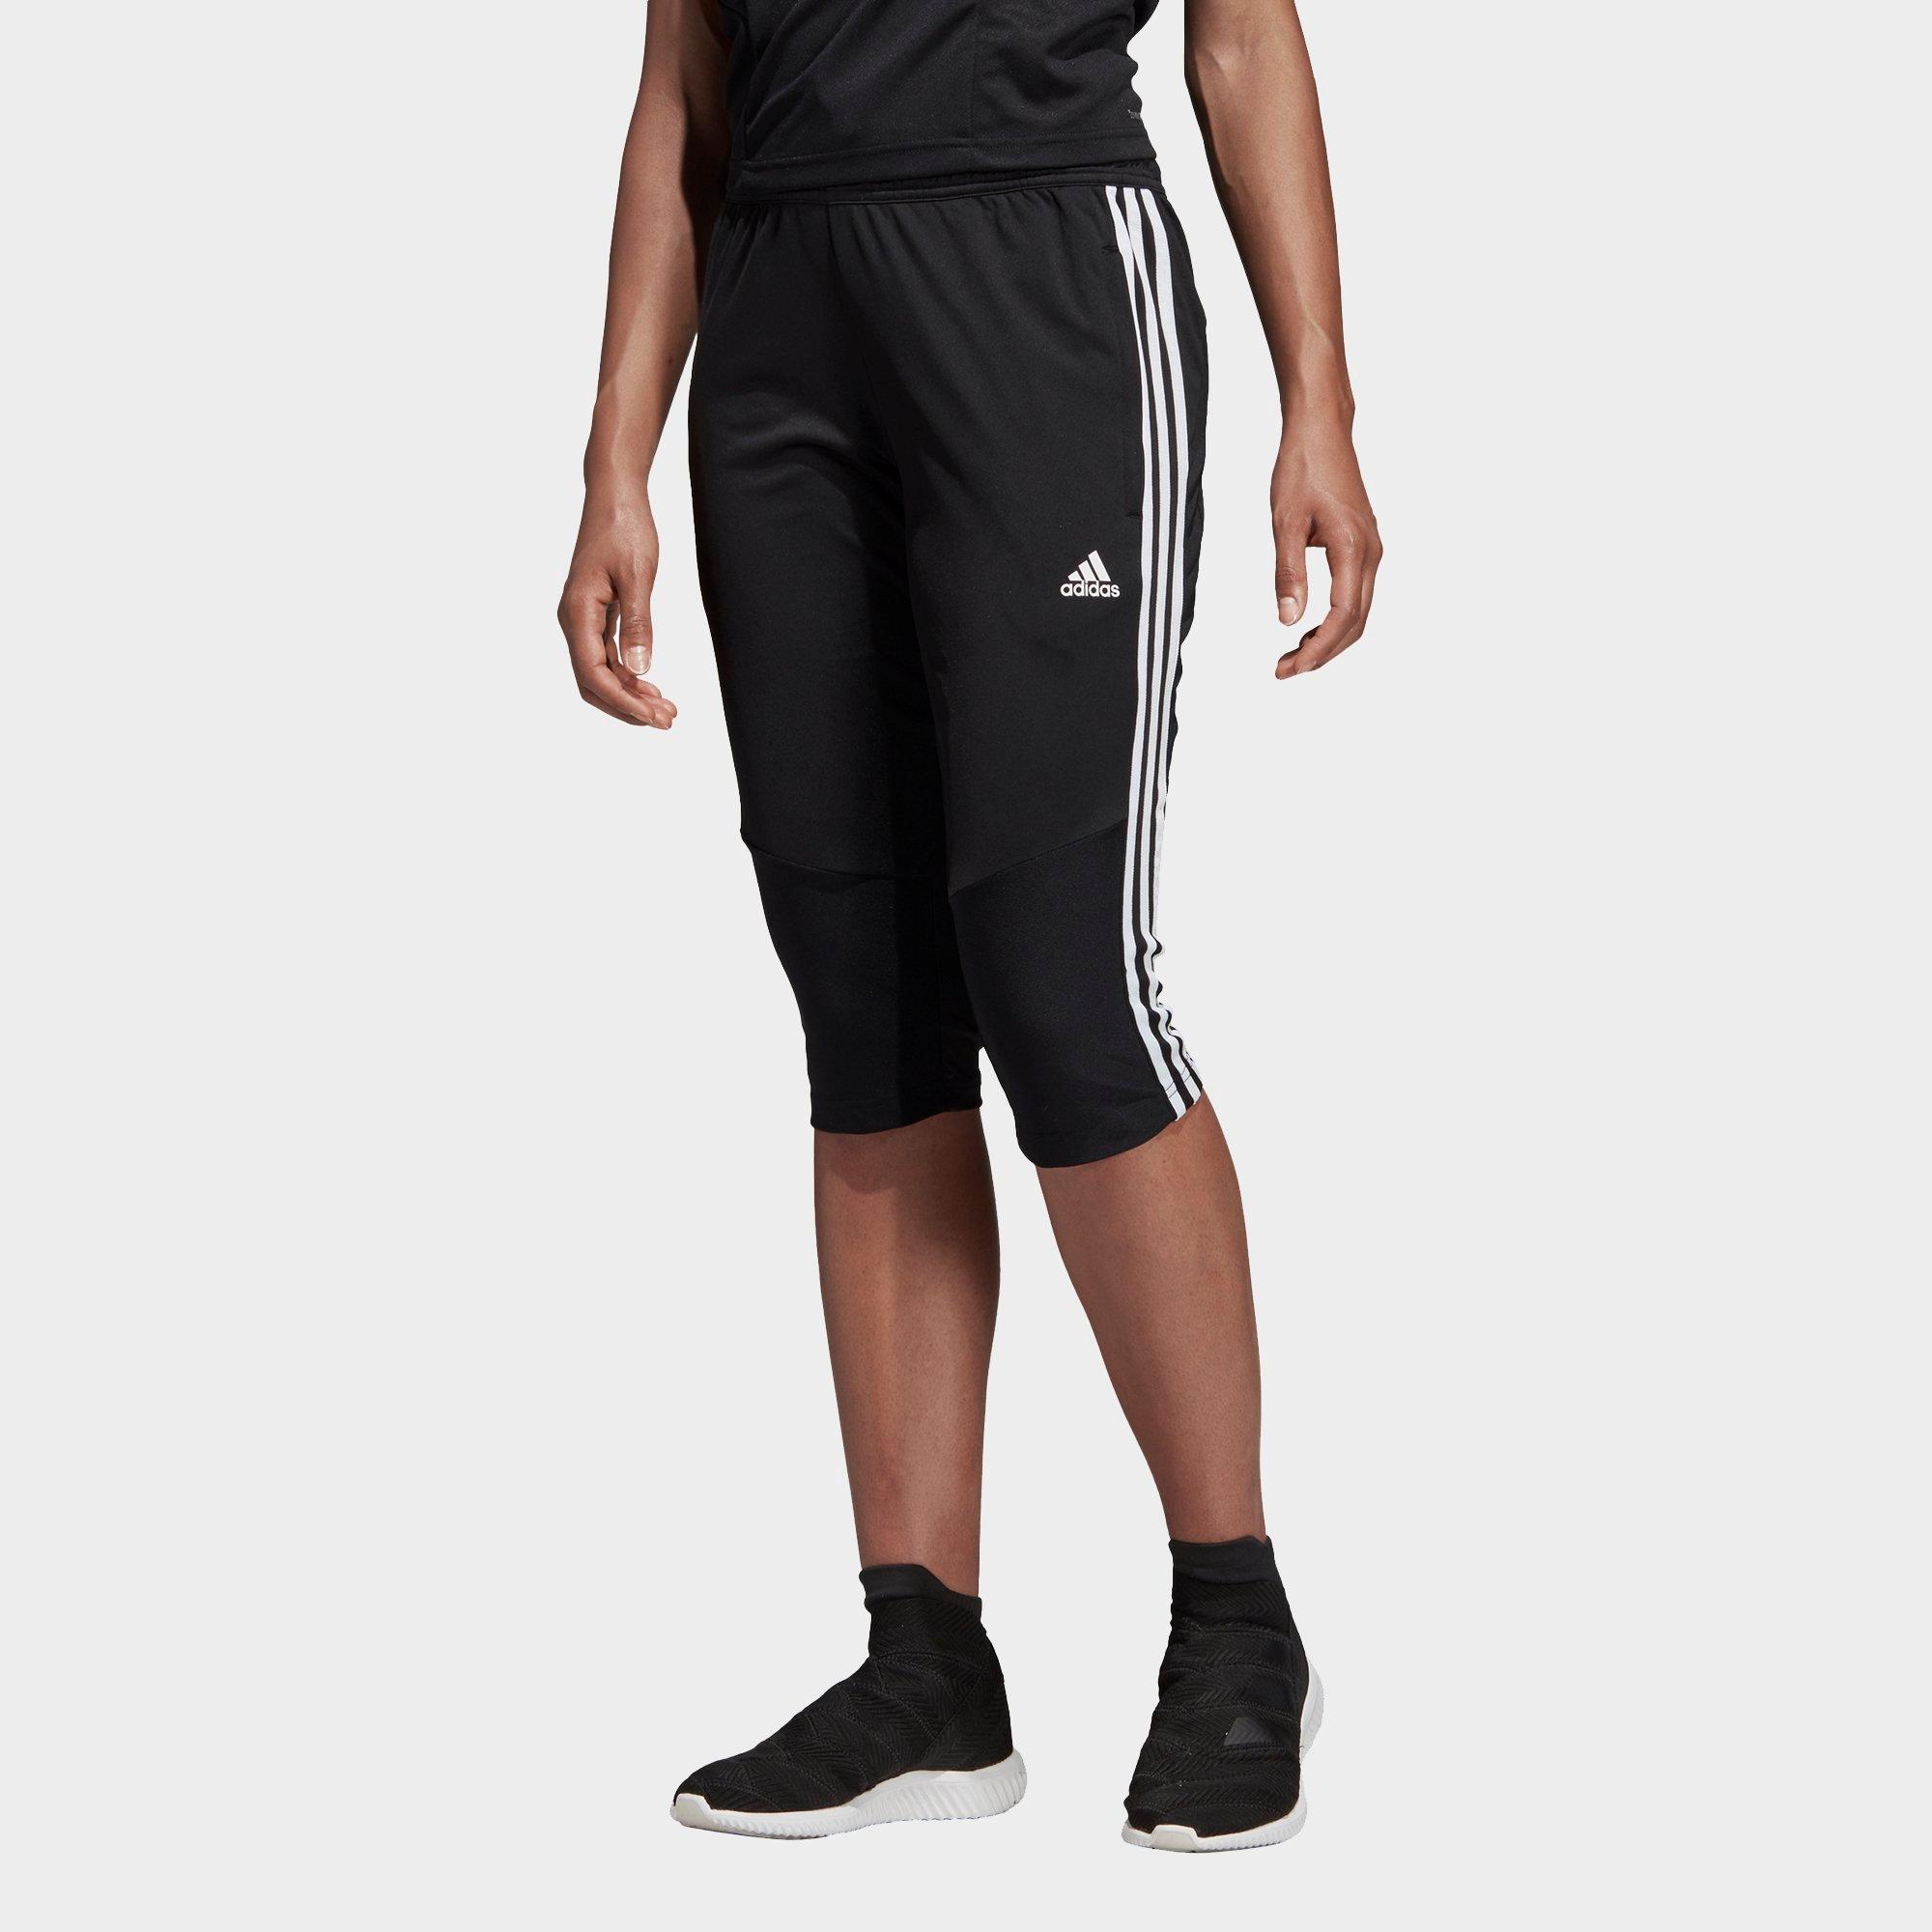 adidas training 3 4 pants